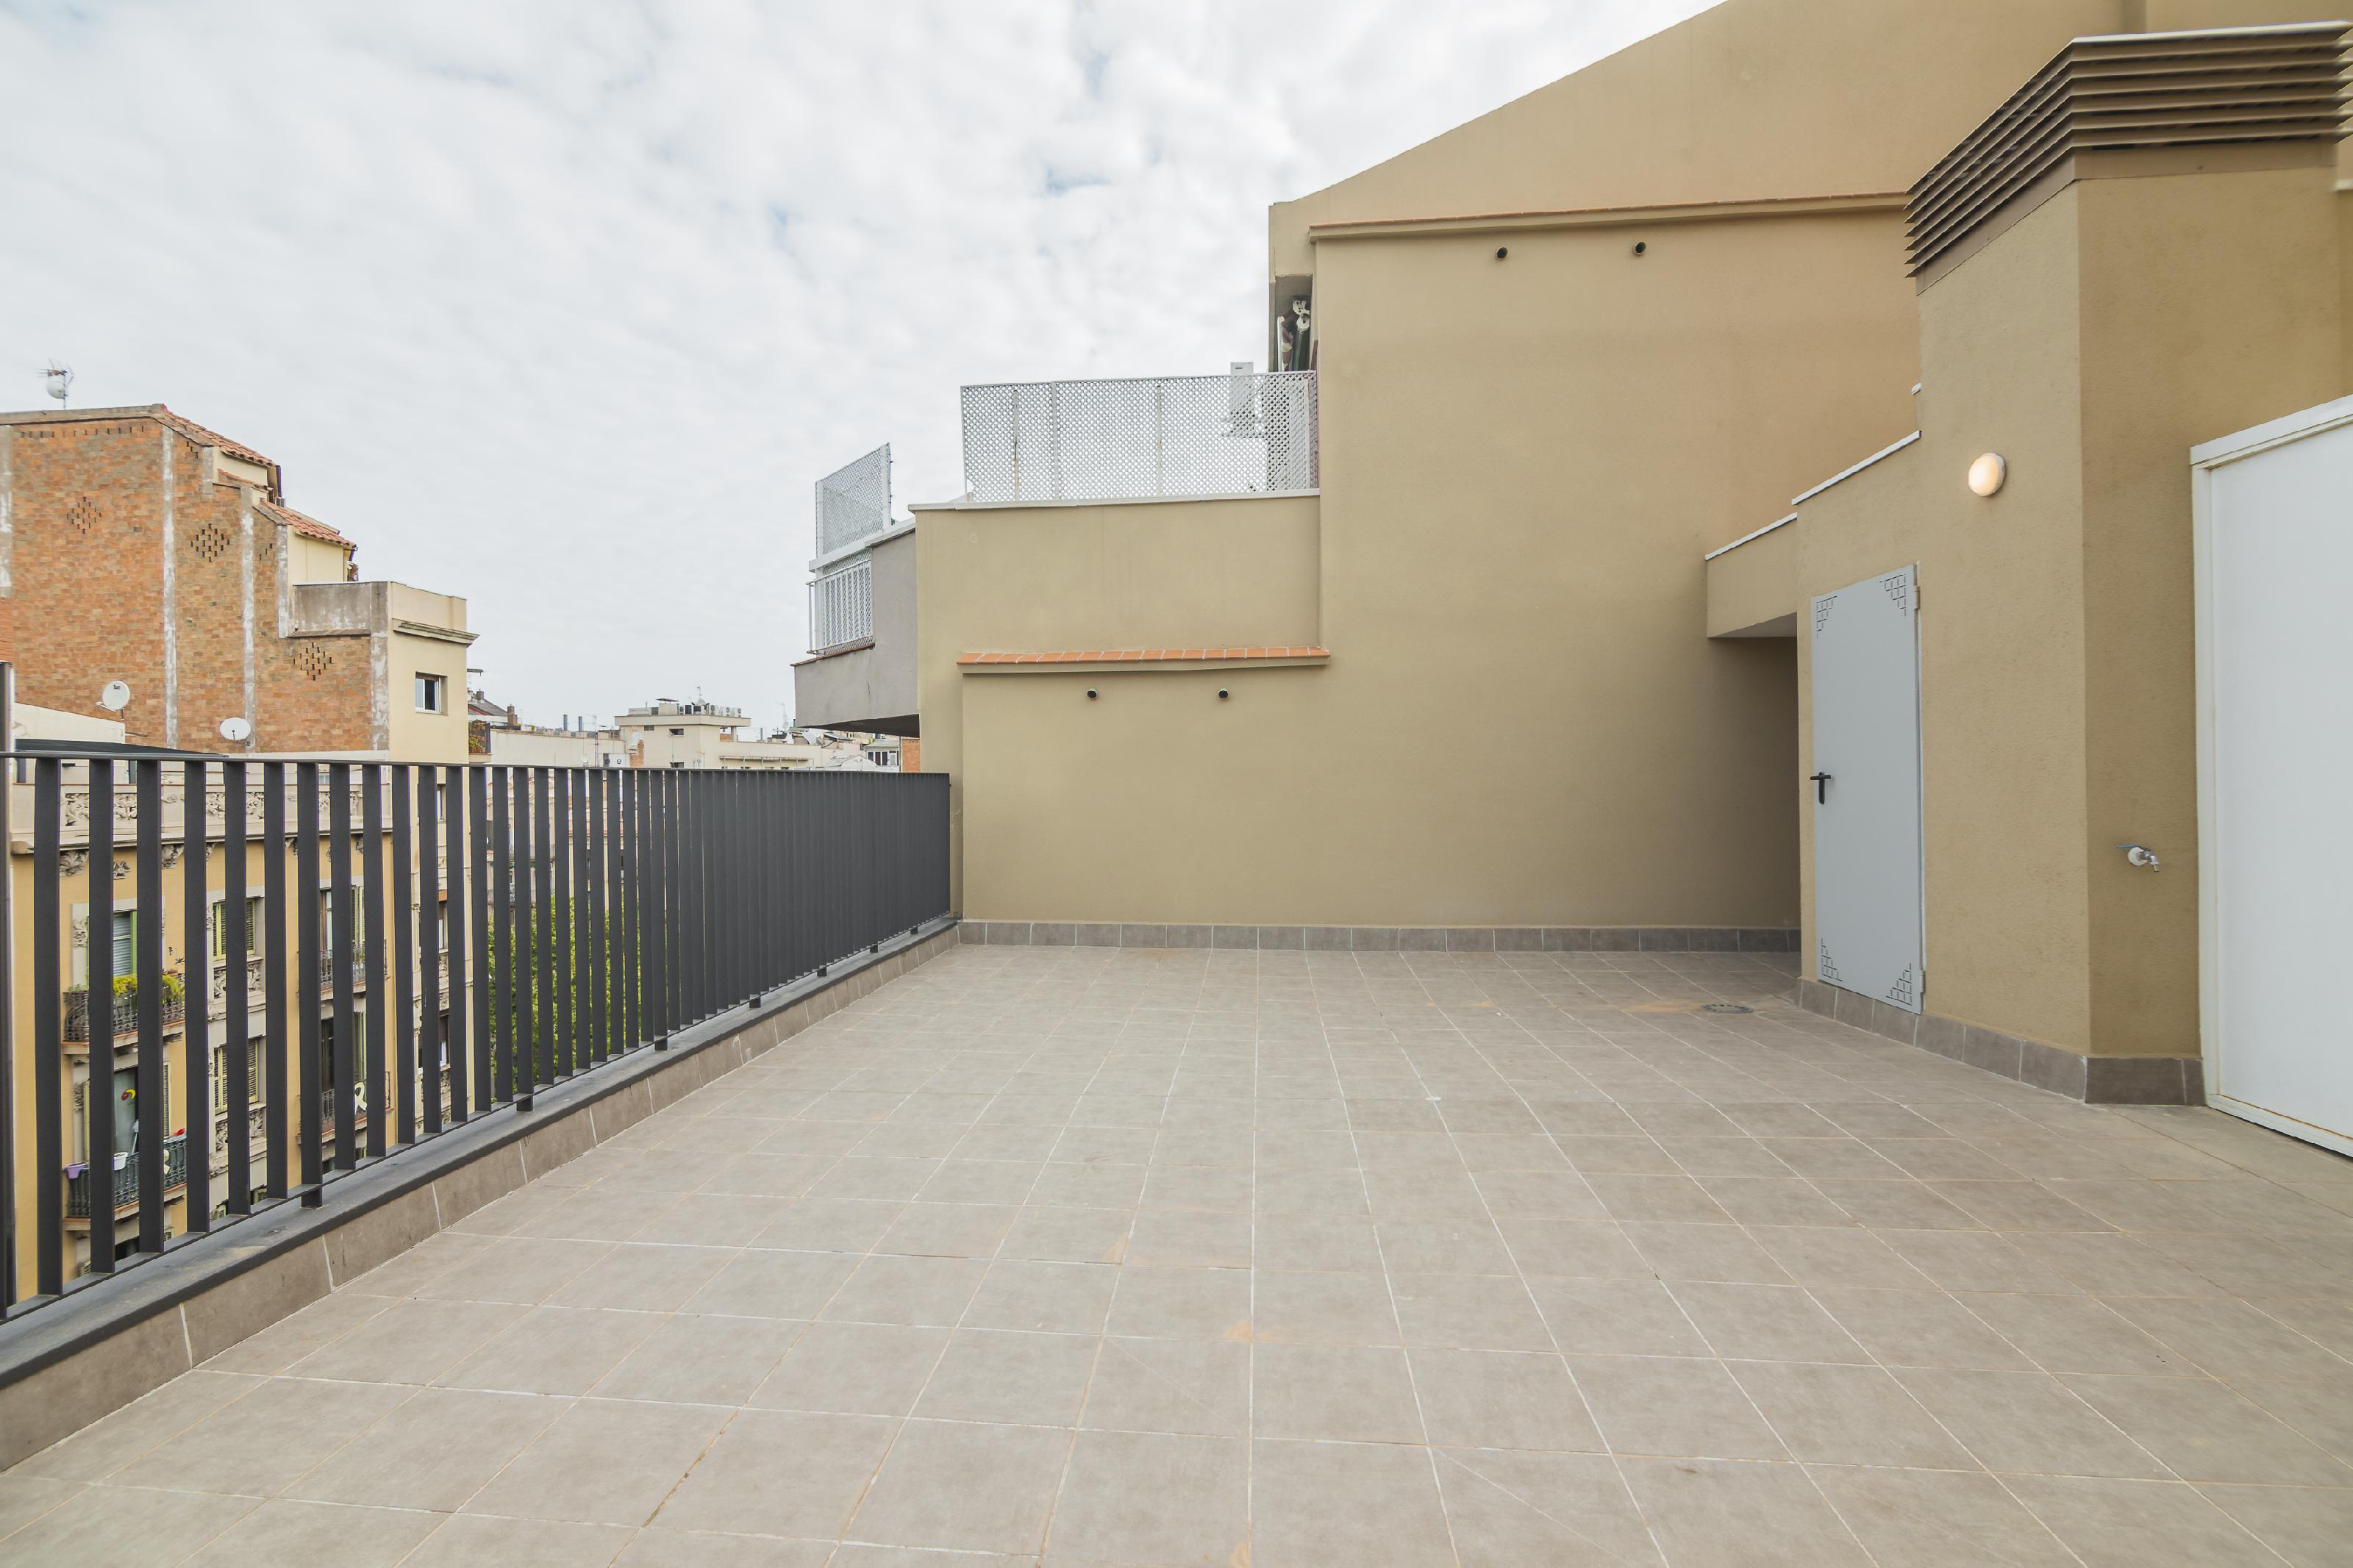 249266 Flat for sale in Eixample, Nova Esquerra Eixample 27